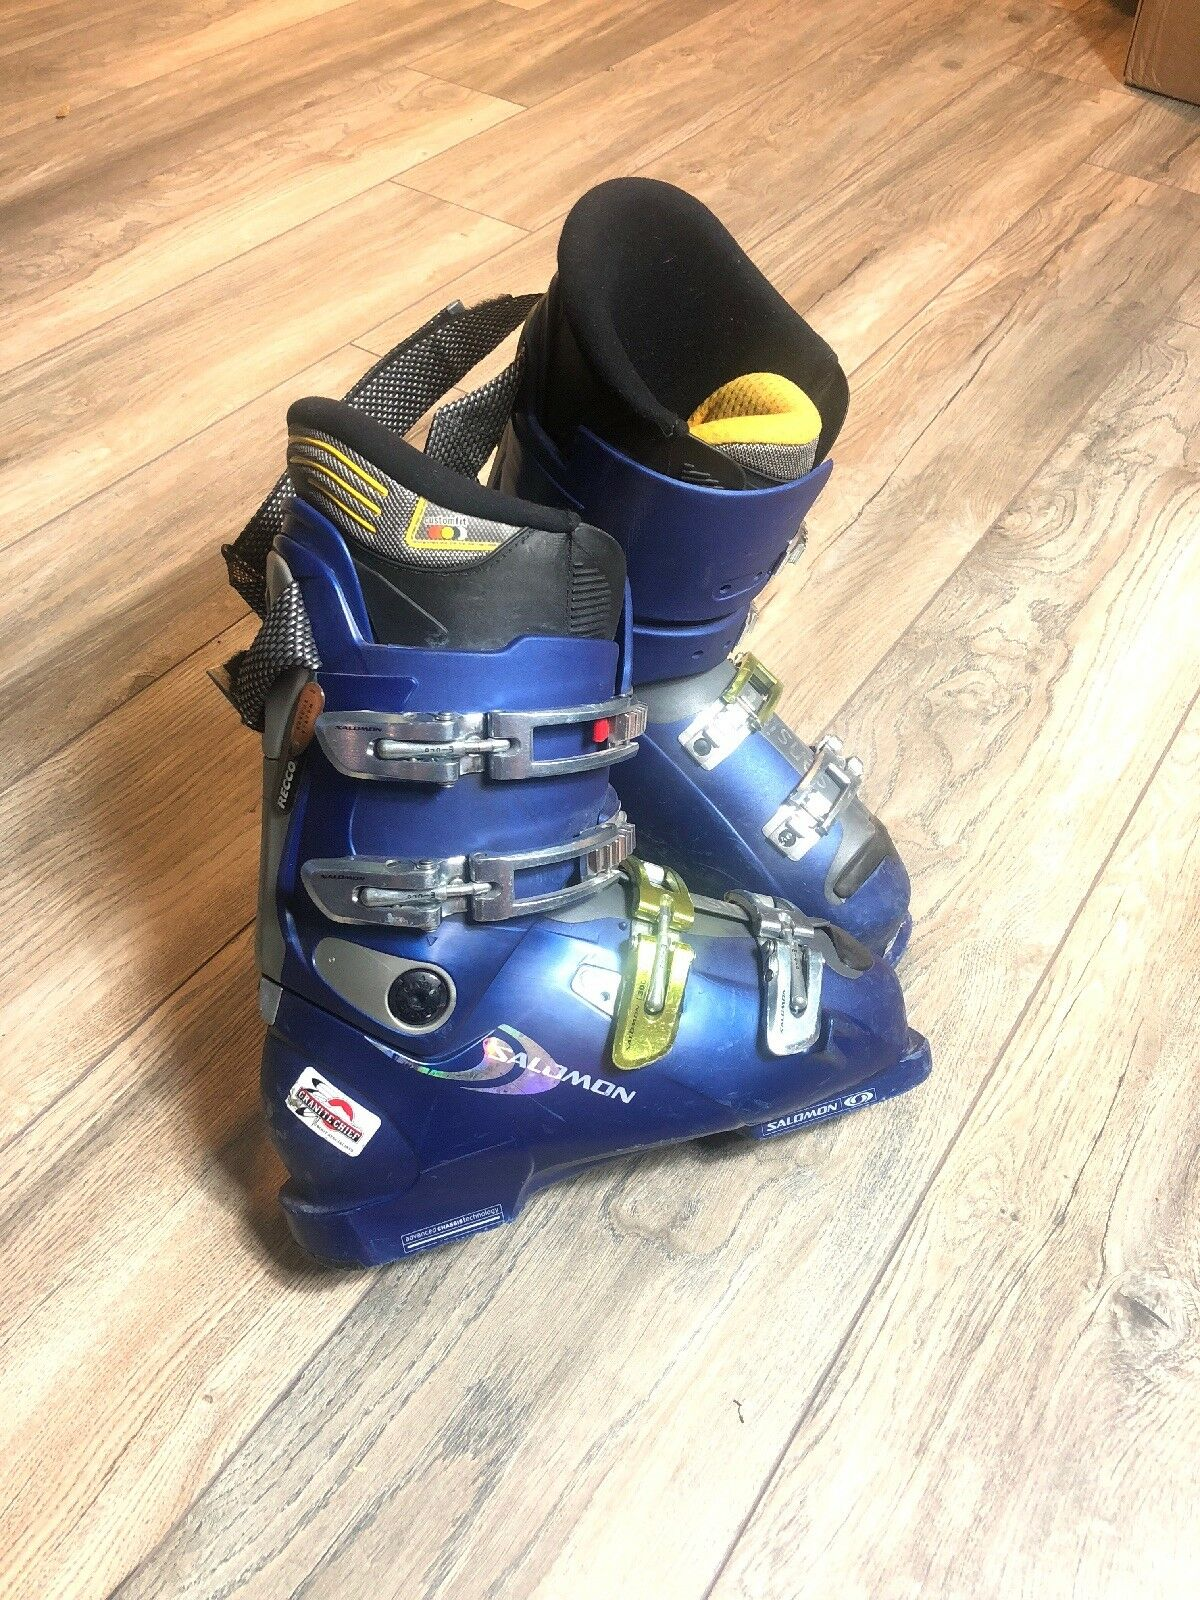 Salomon XWAVE 8.0 Men's US 9.5 27.5 Downhill Ski Boots